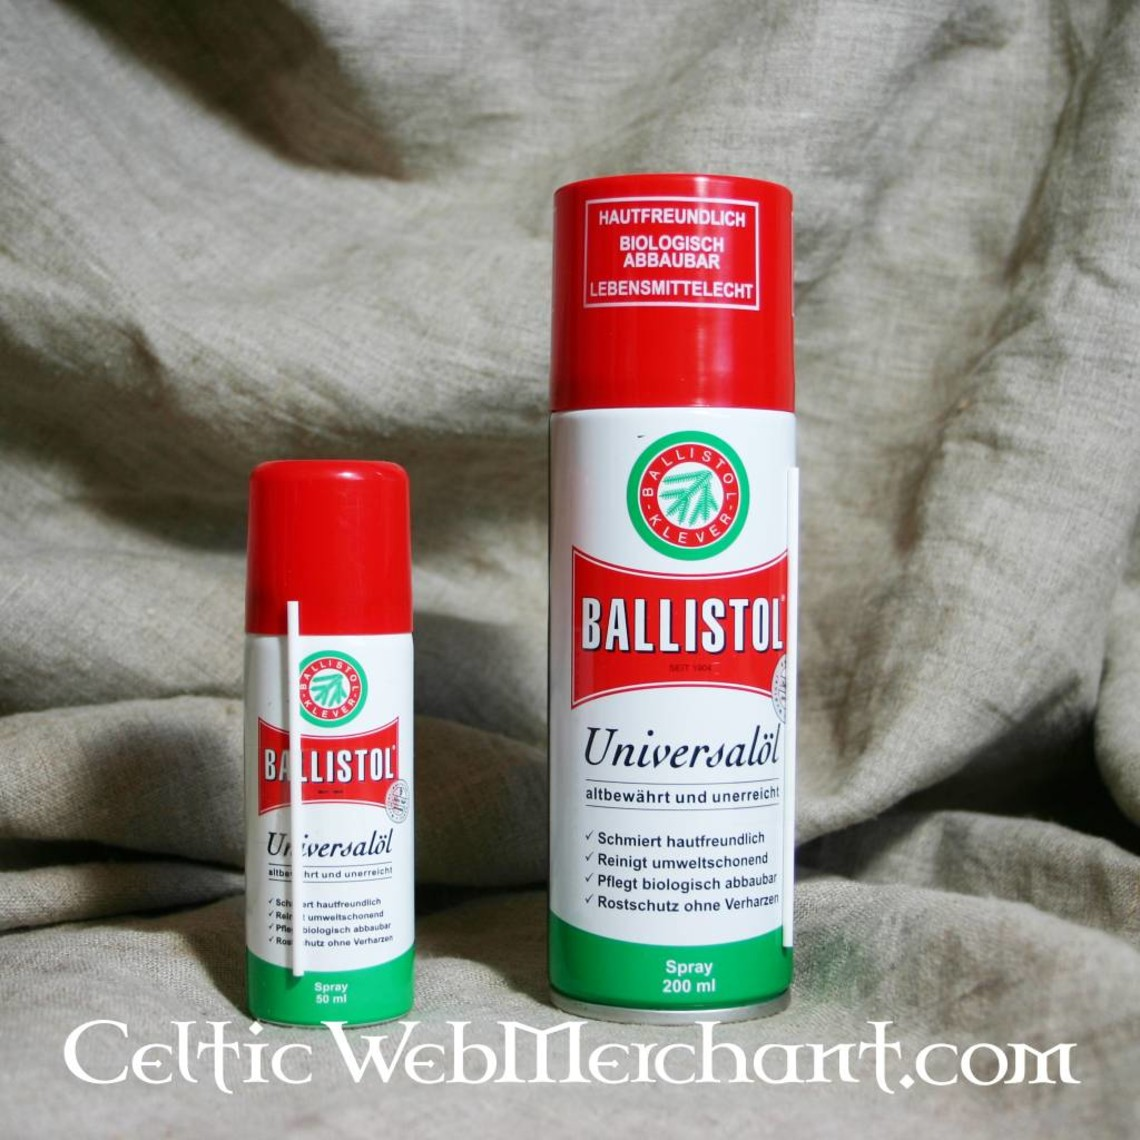 Ballistol Ballistol antiroestspray, 50 ml (alleen EU))